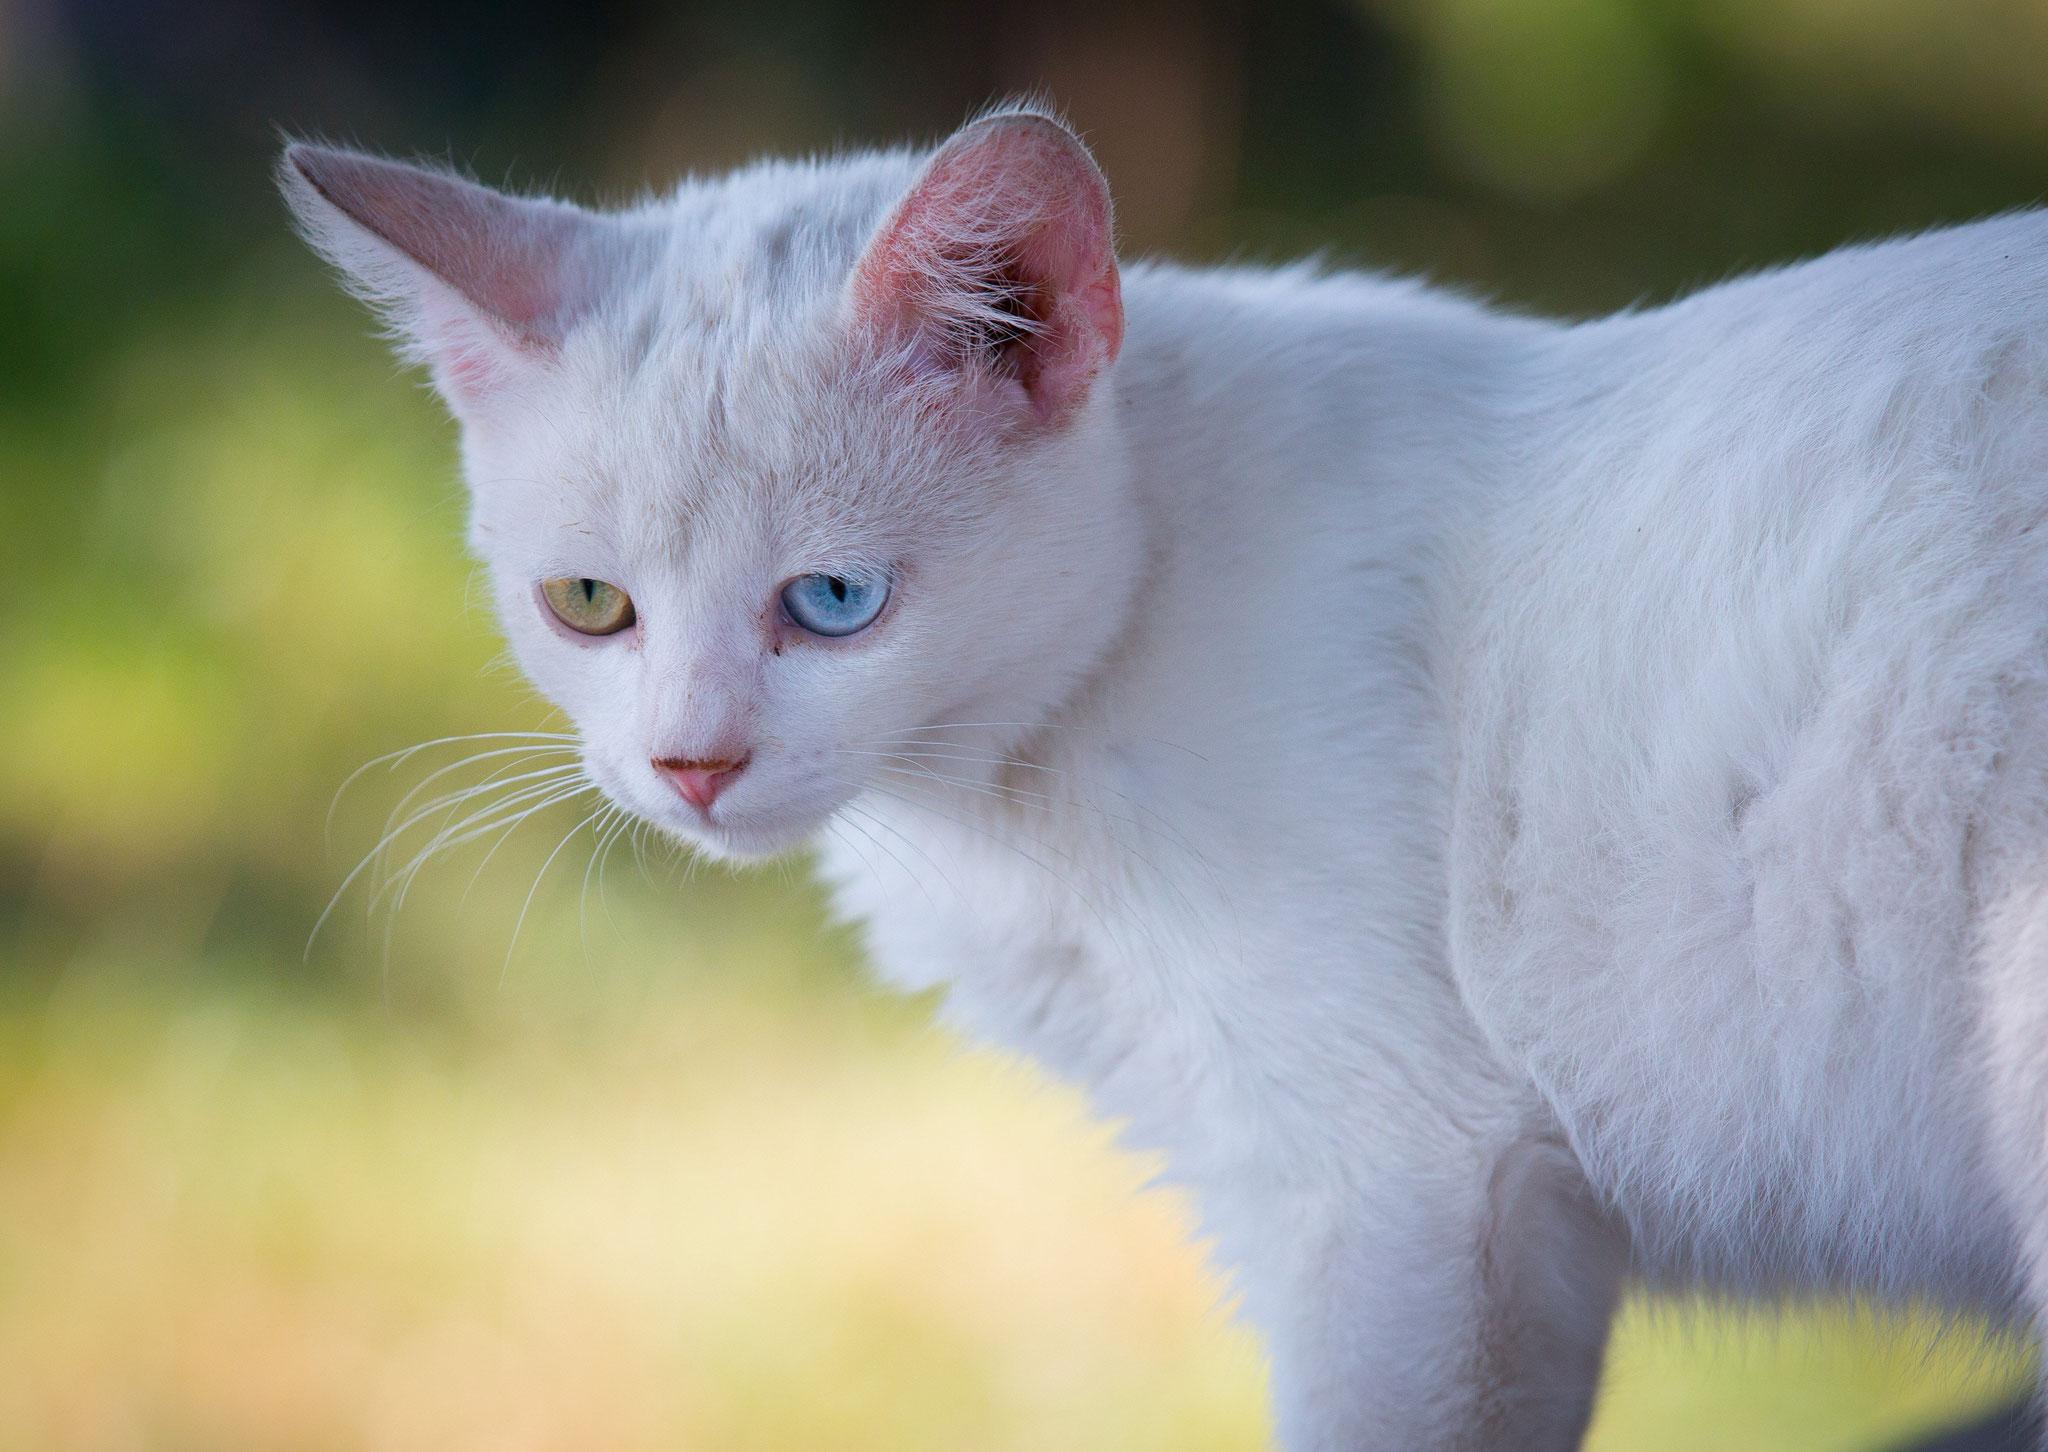 Givemeasmile - Katze - Fotograf Viviane Jäger